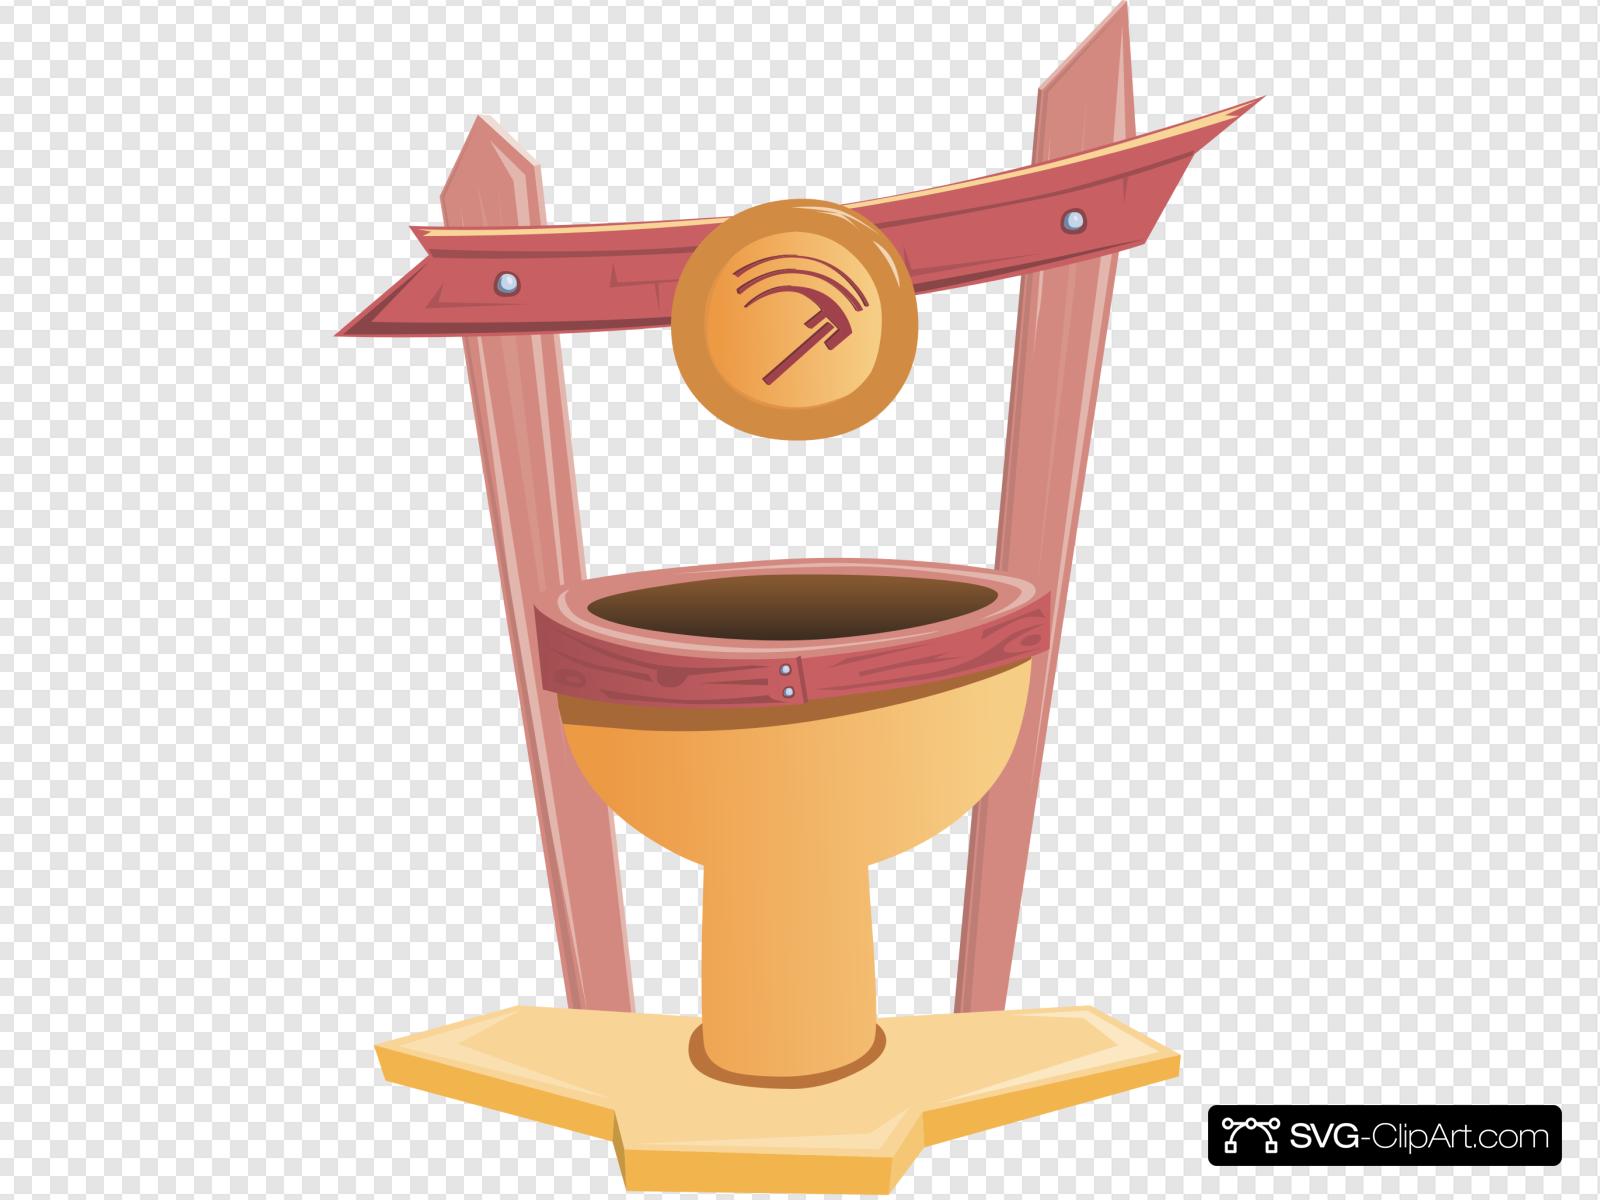 Shrine Ix Mab Clip art, Icon and SVG.